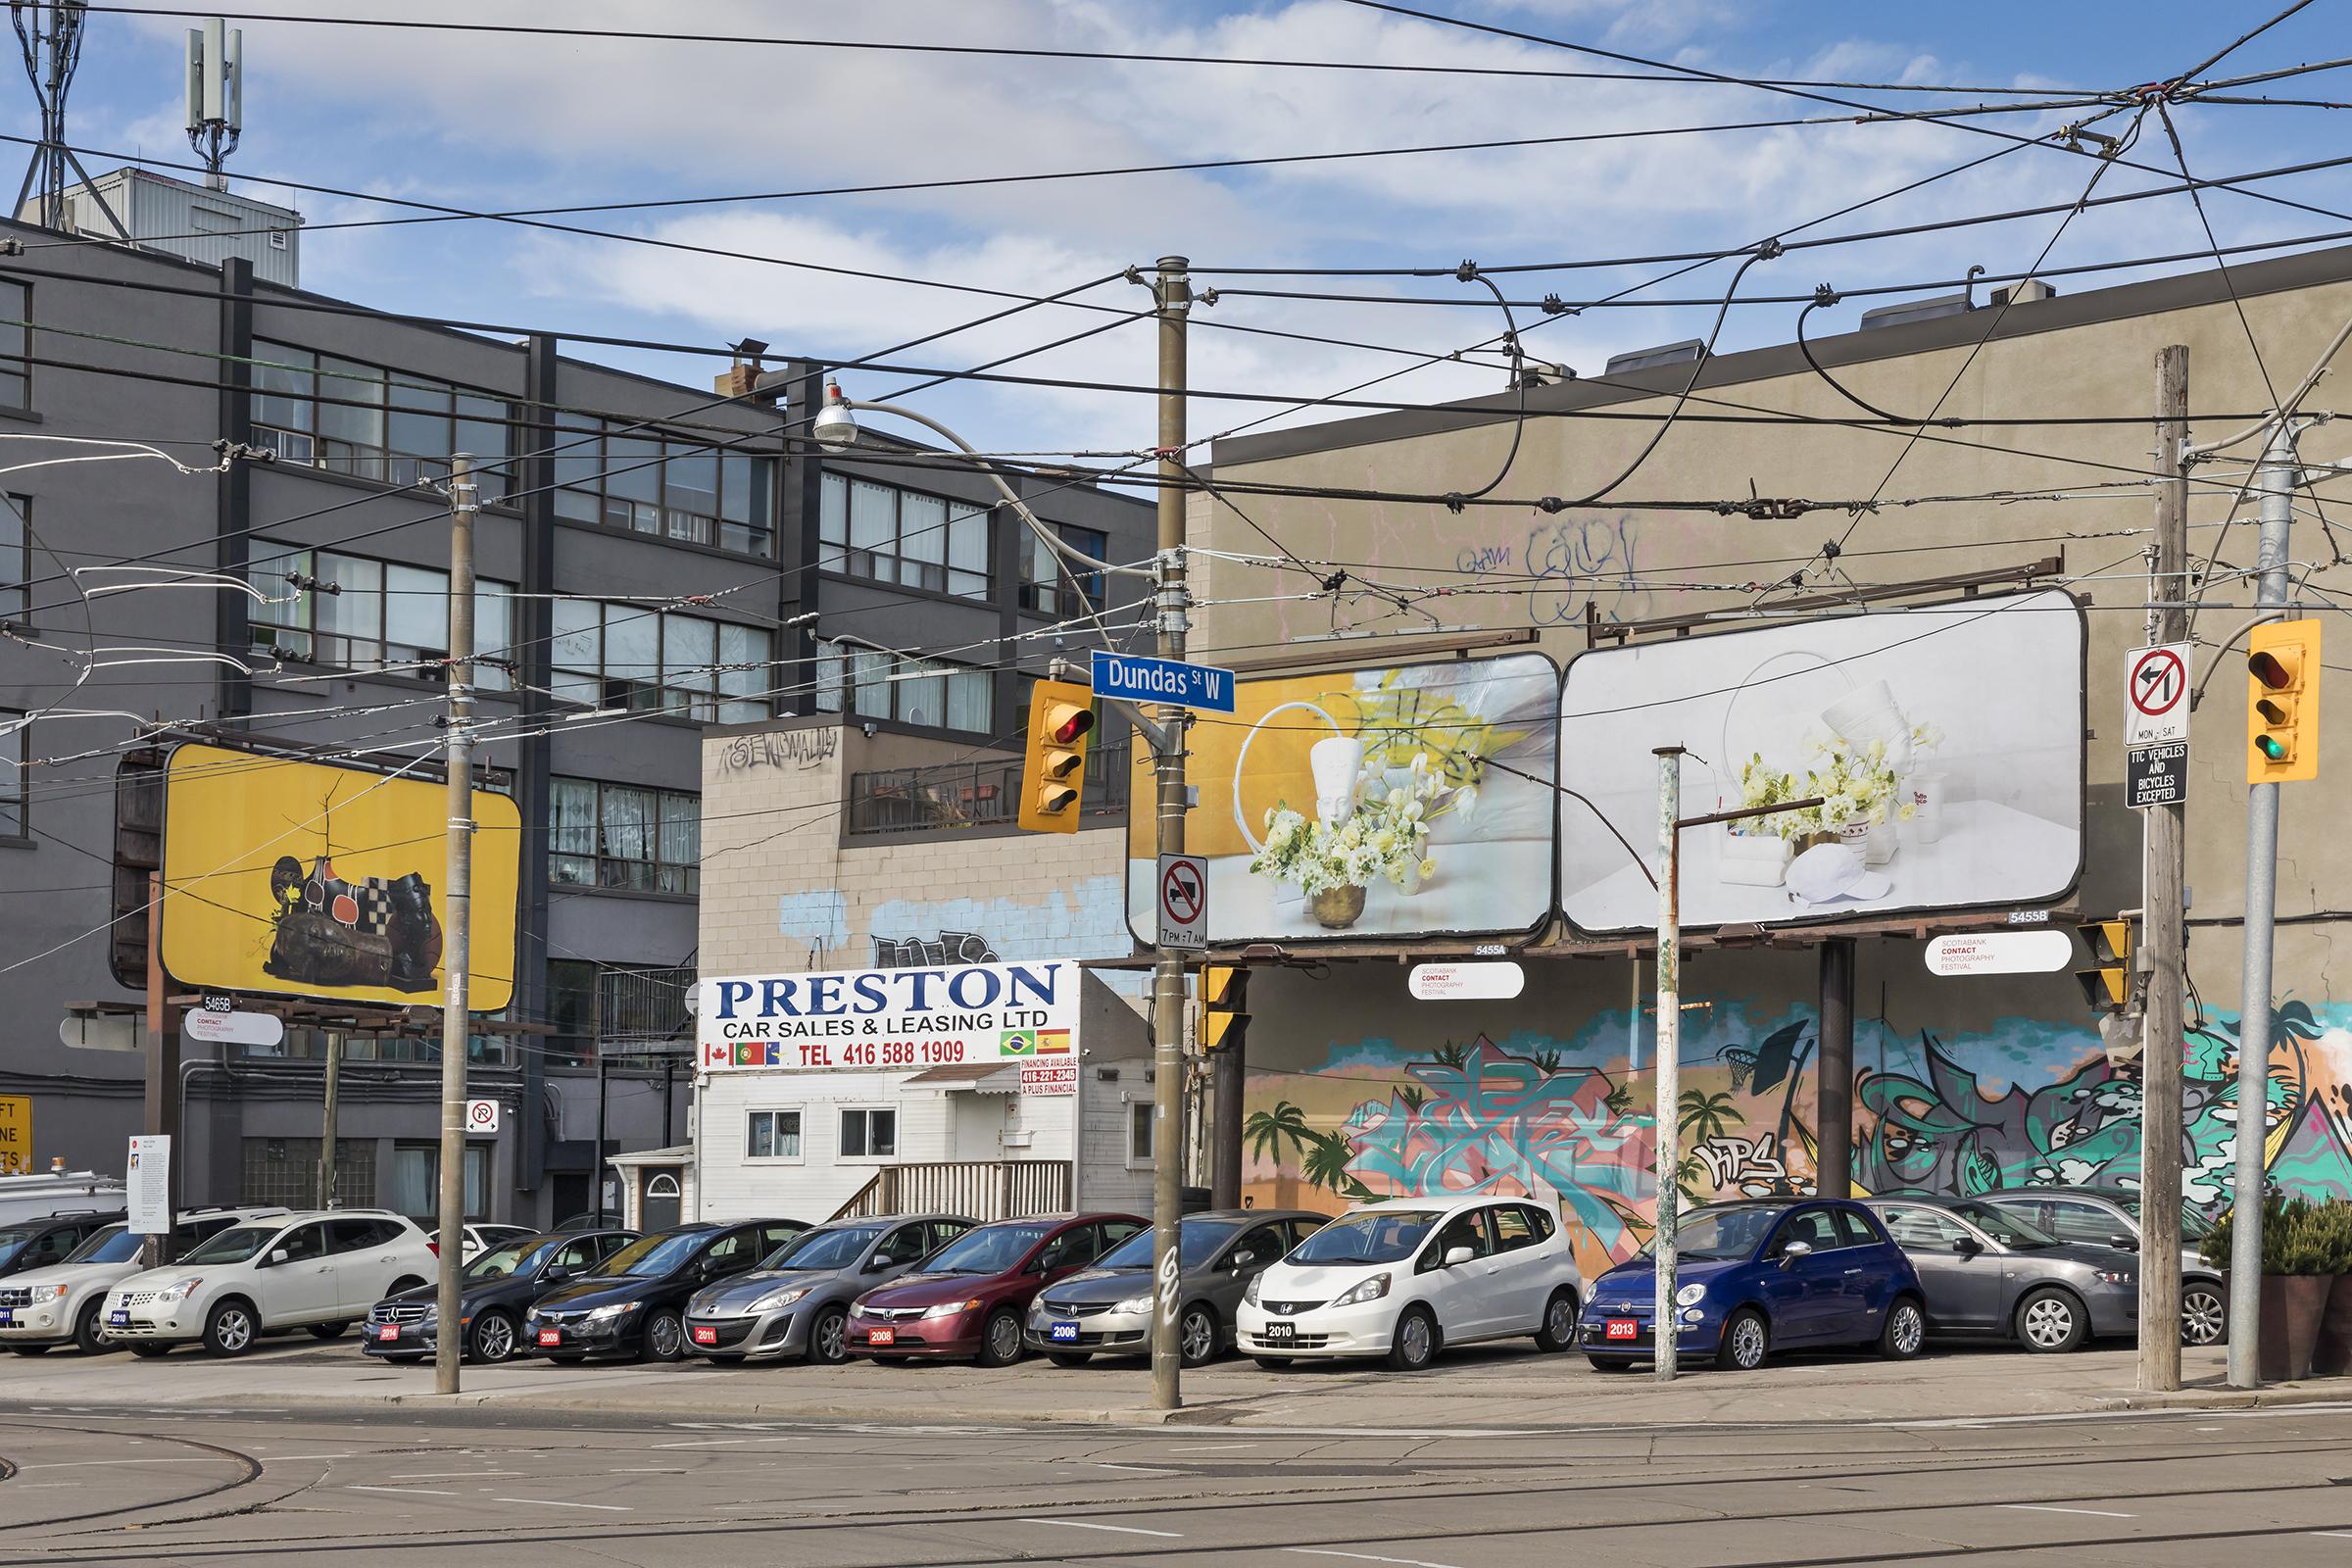 Awol Erizku, Say Less, 2018. Billboard installation on Lansdowne Avenue at Dundas Street W and College Street, Toronto. Photo by Toni Hafkenscheid.